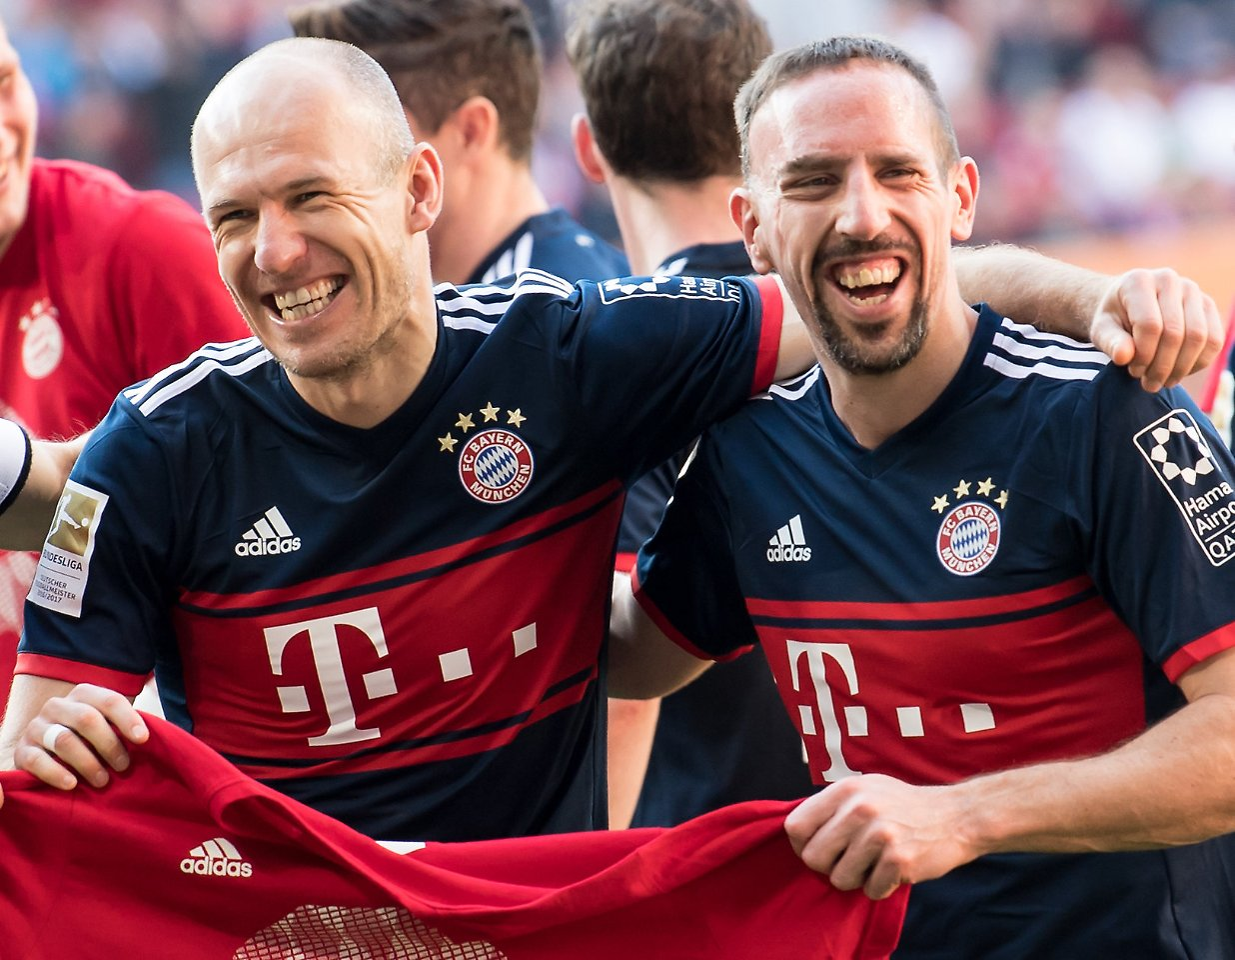 Perfekt: Ribéry verlängert Vertrag beim FC Bayern